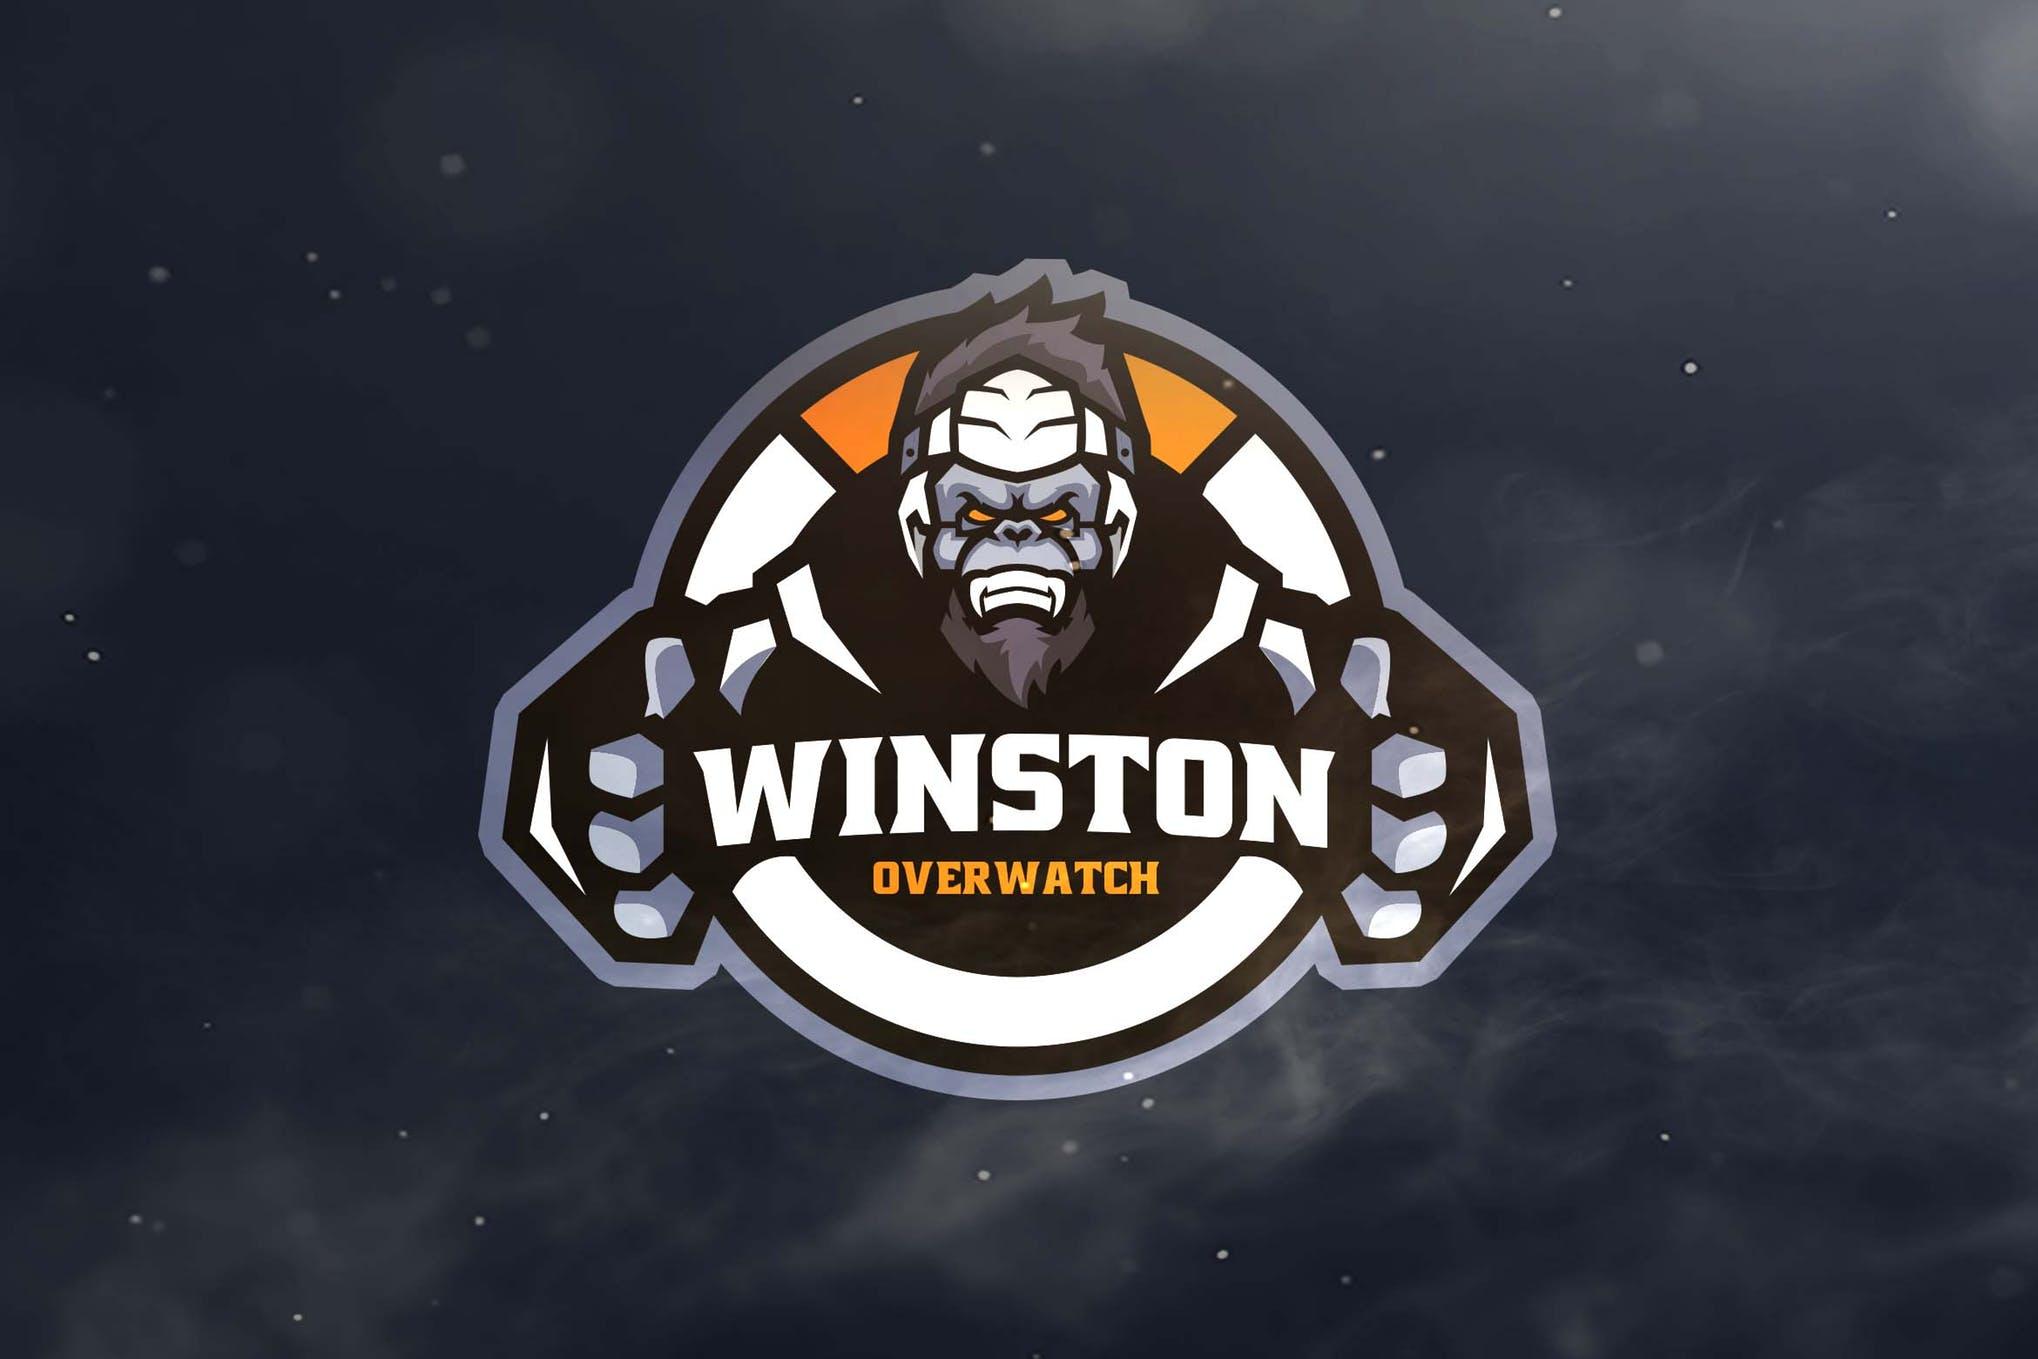 Winston Sport and Esports Logos by ovozdigital on Envato Elements.